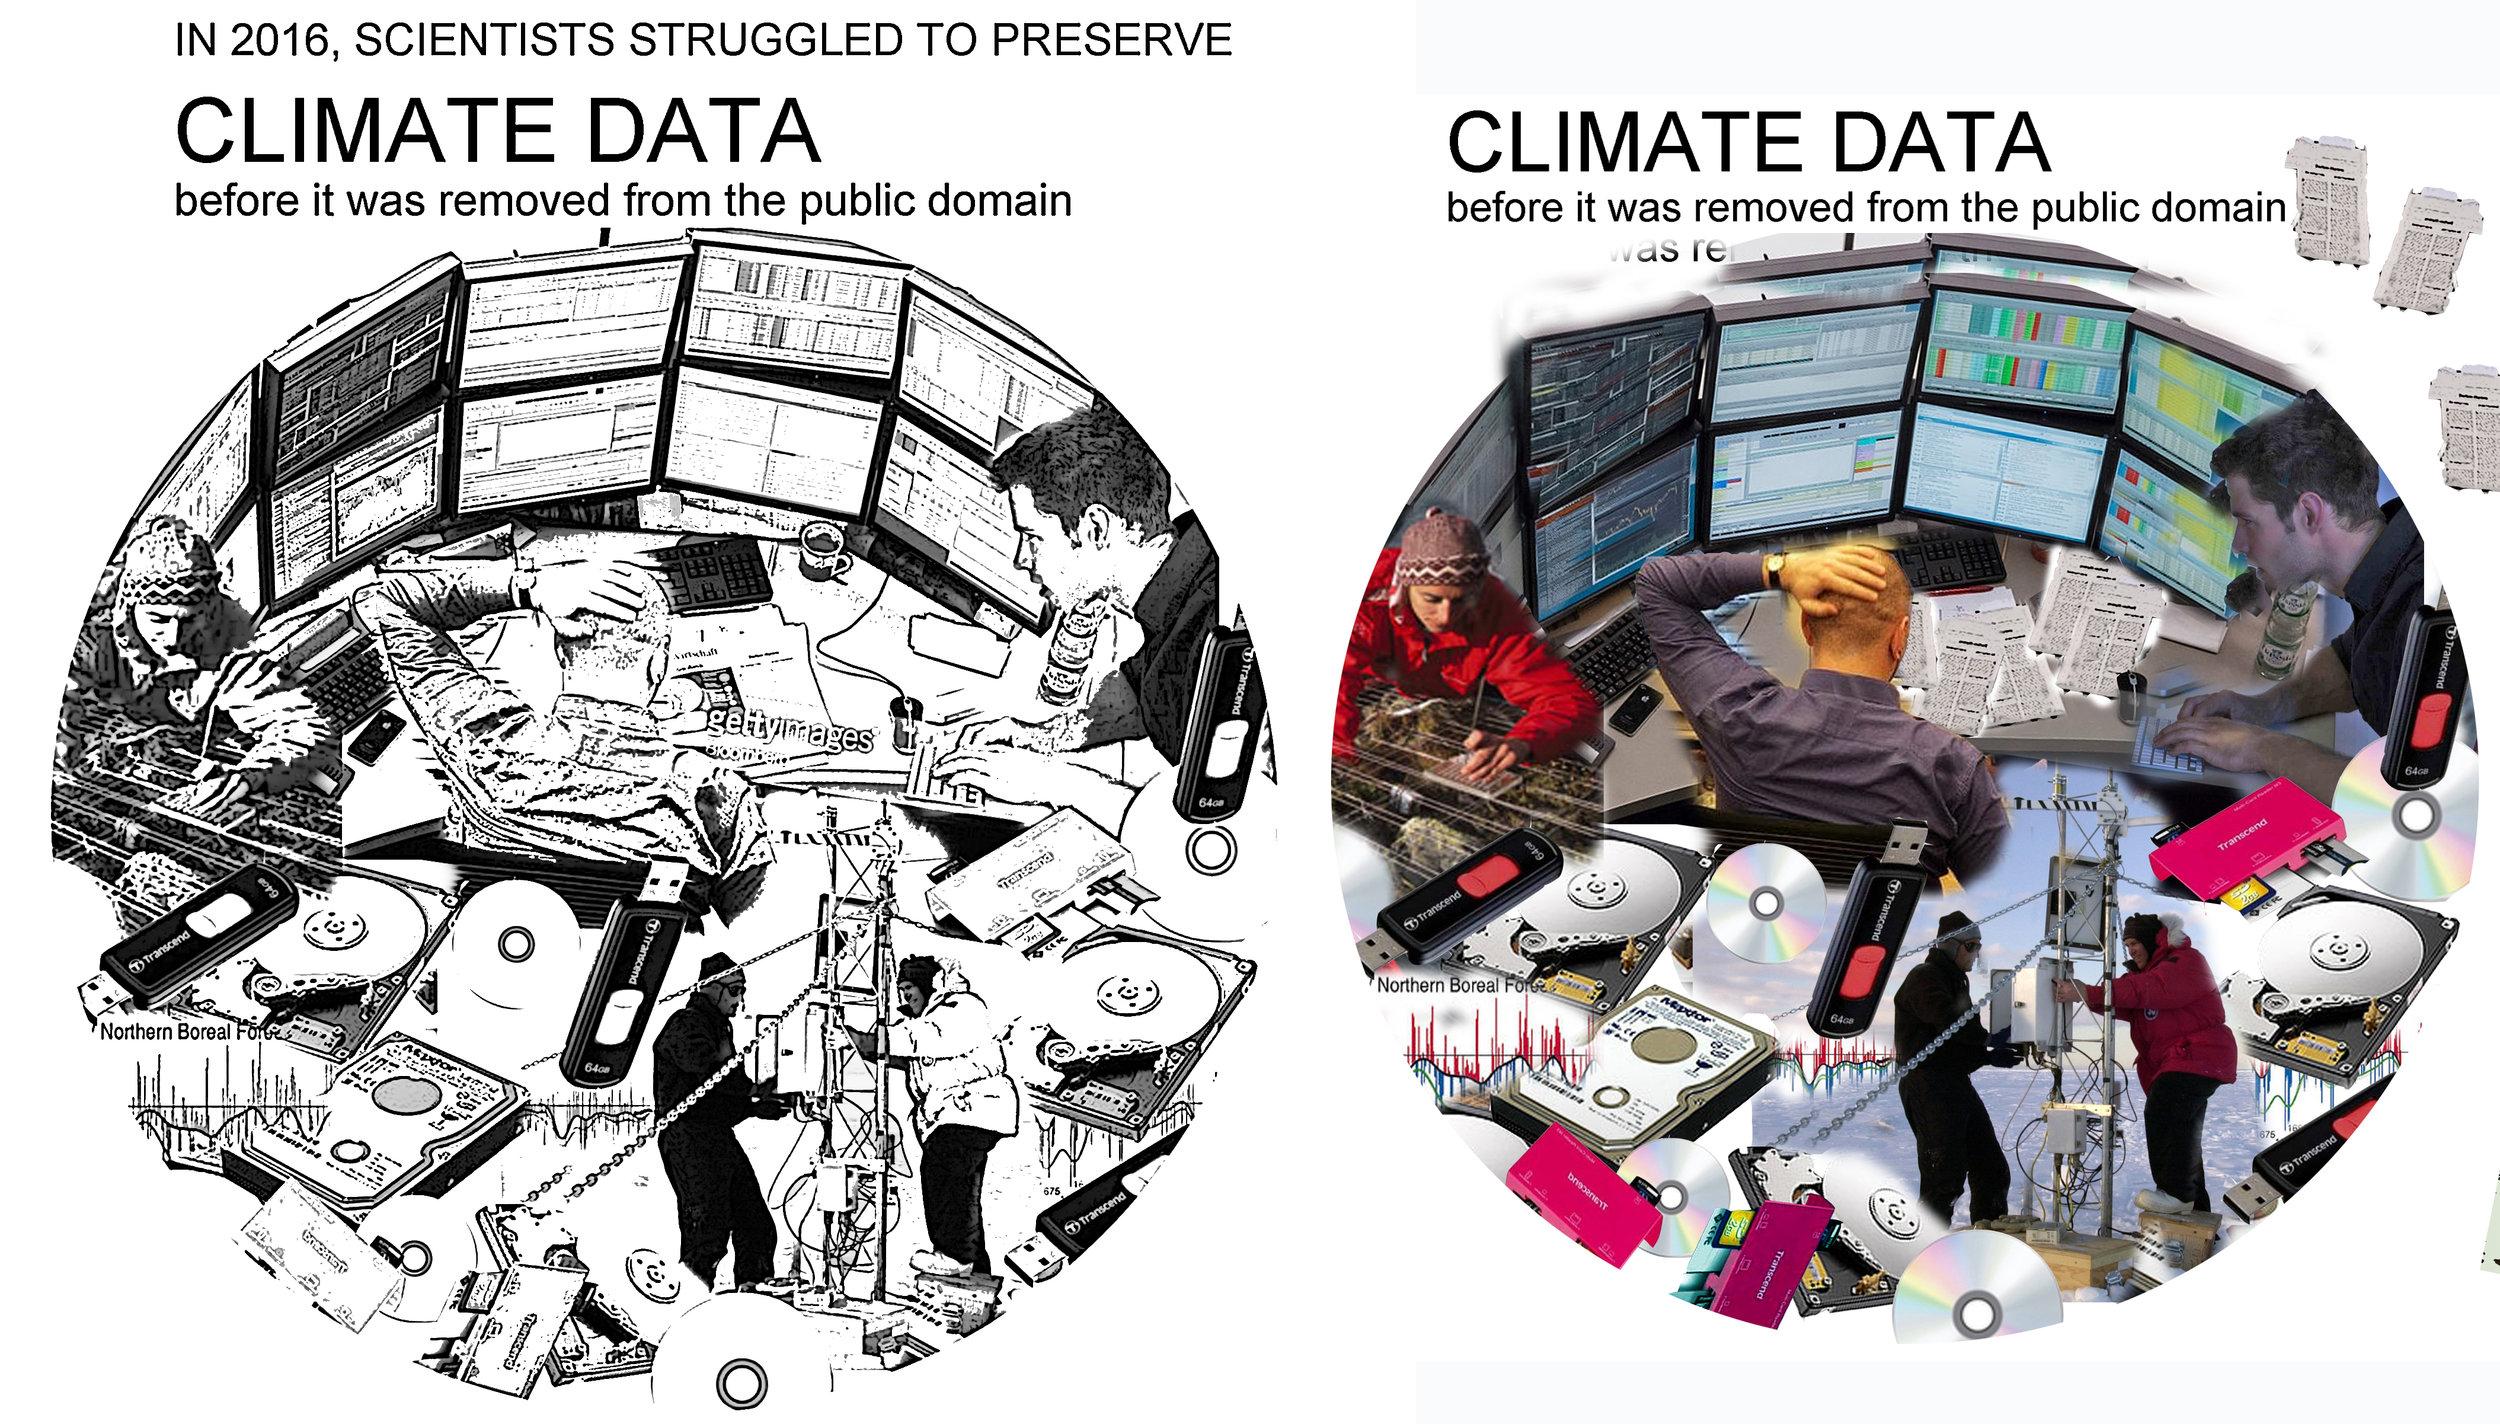 climate data sq B&W combination.jpg